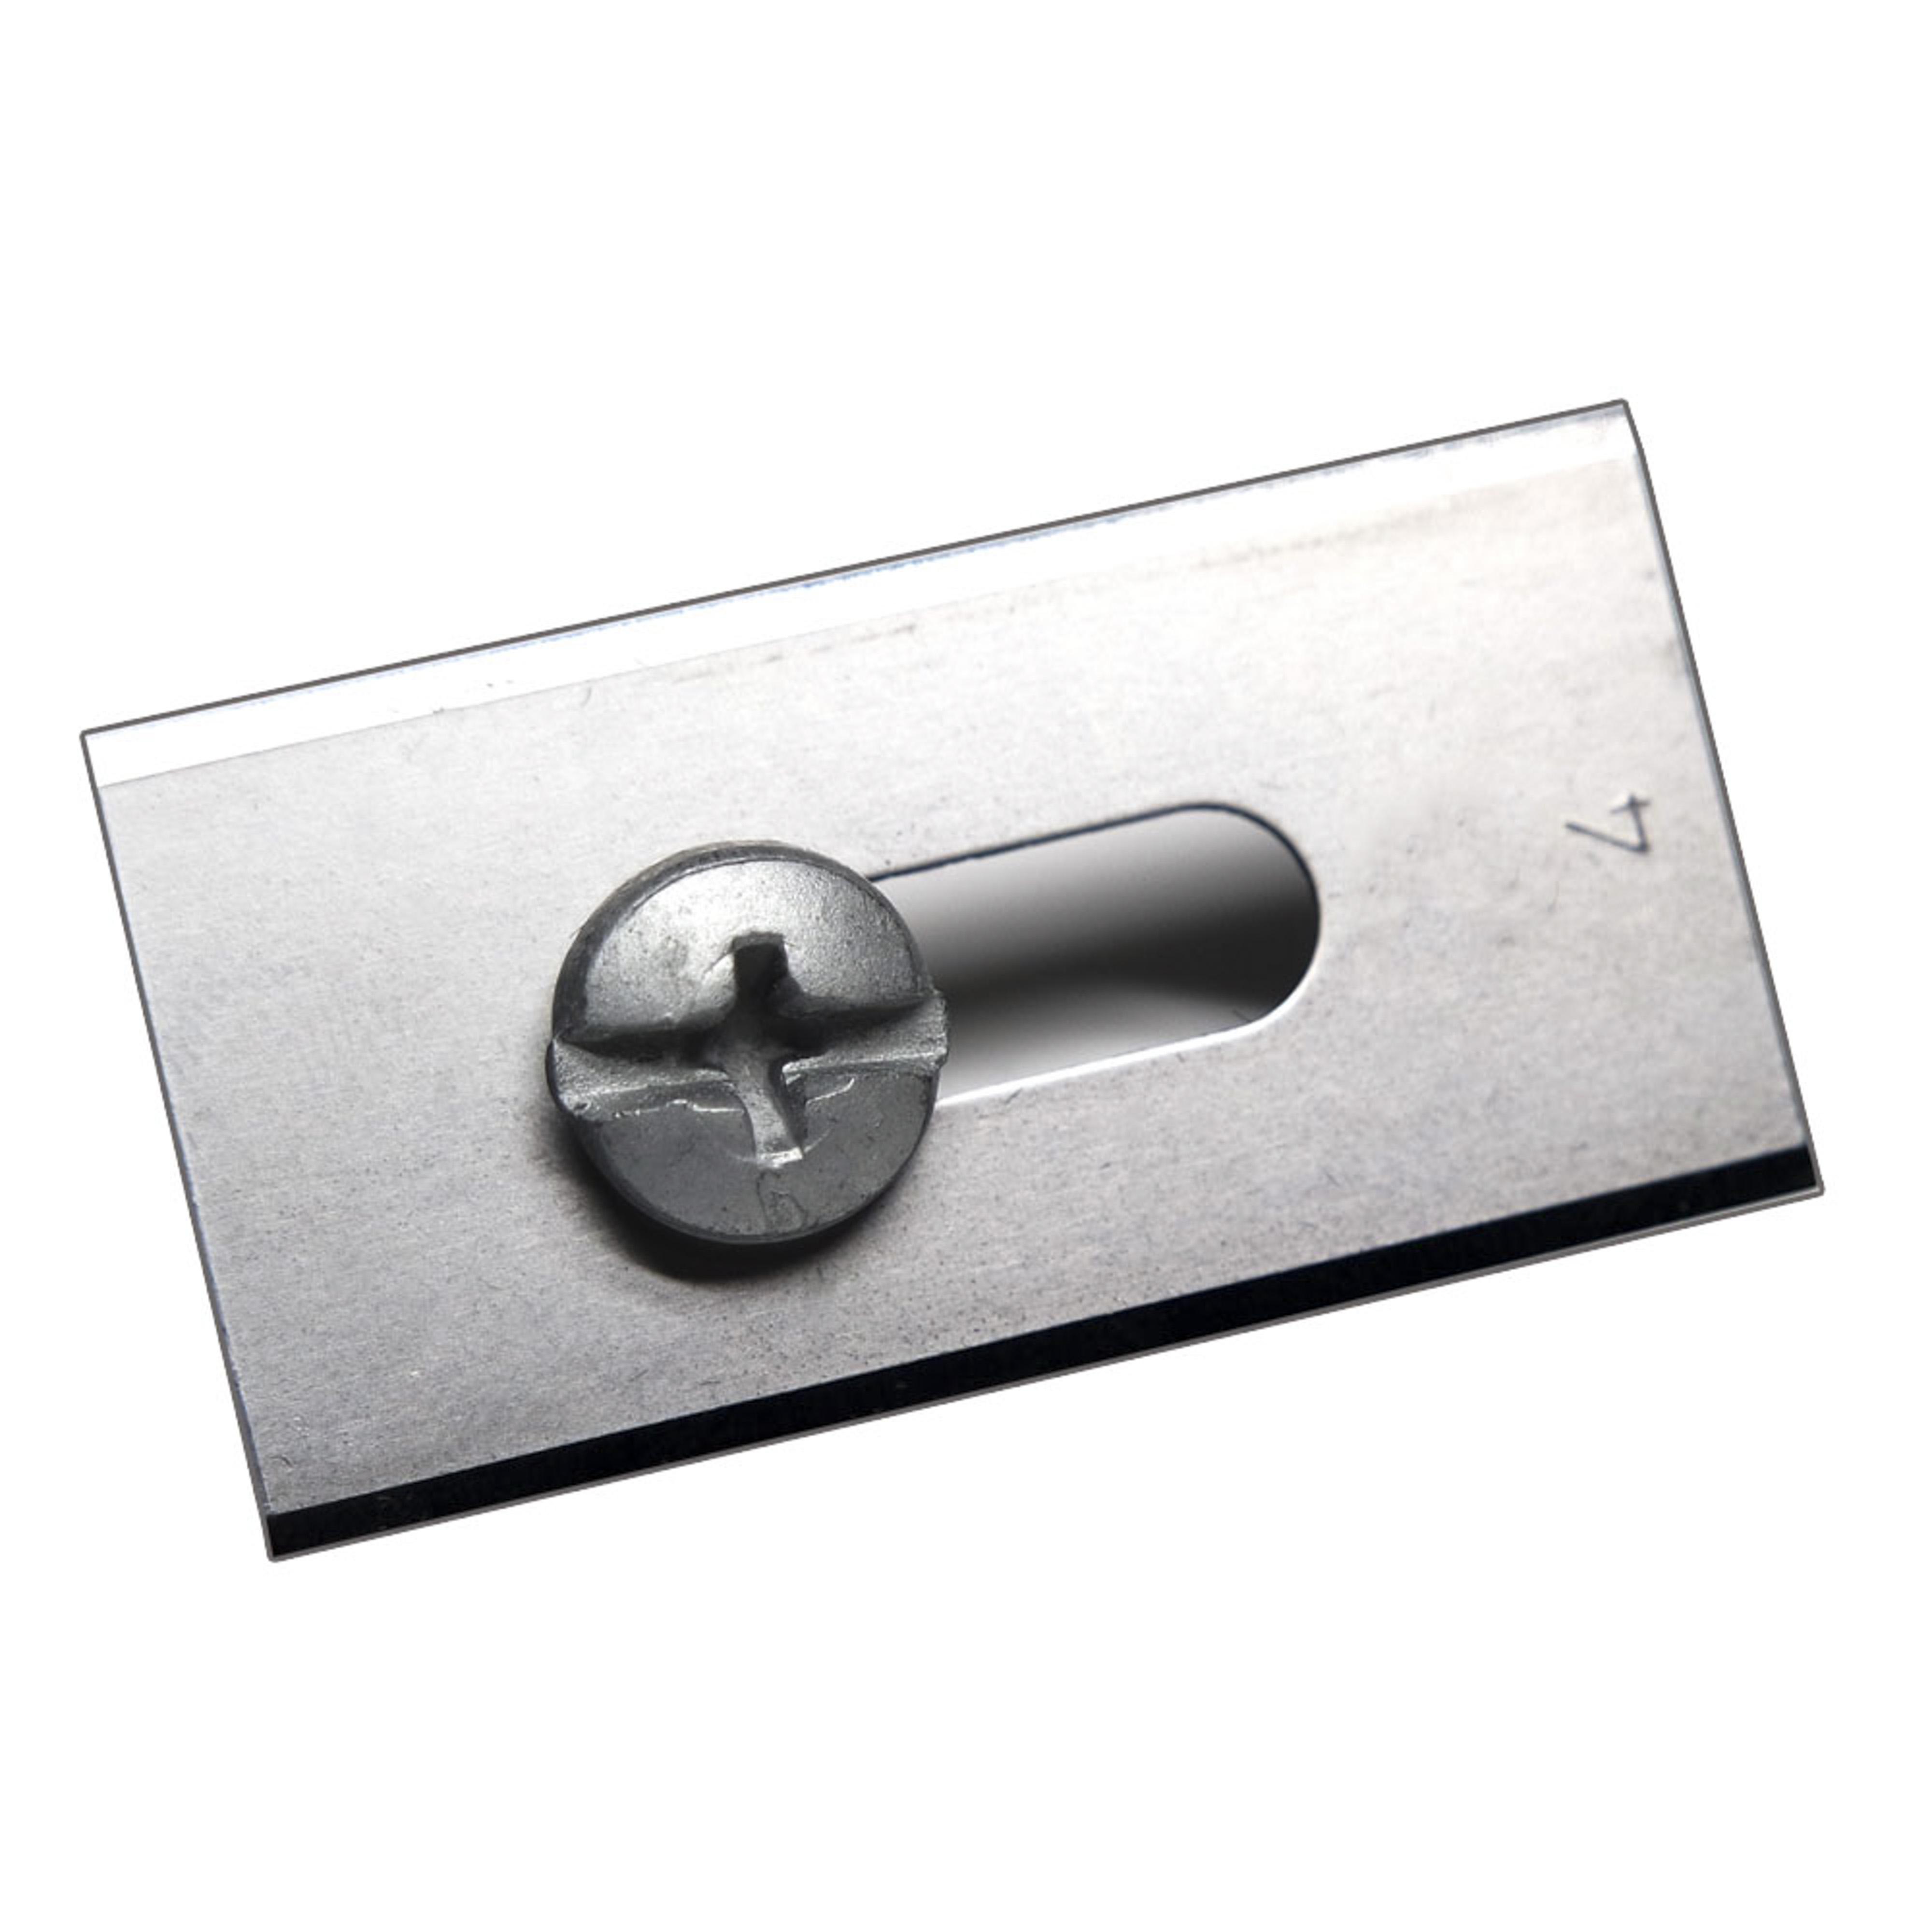 9x TITAN *Ti3* Ersatzmesser Messer Klingen Husqvarna® Automower 220 230 305 308